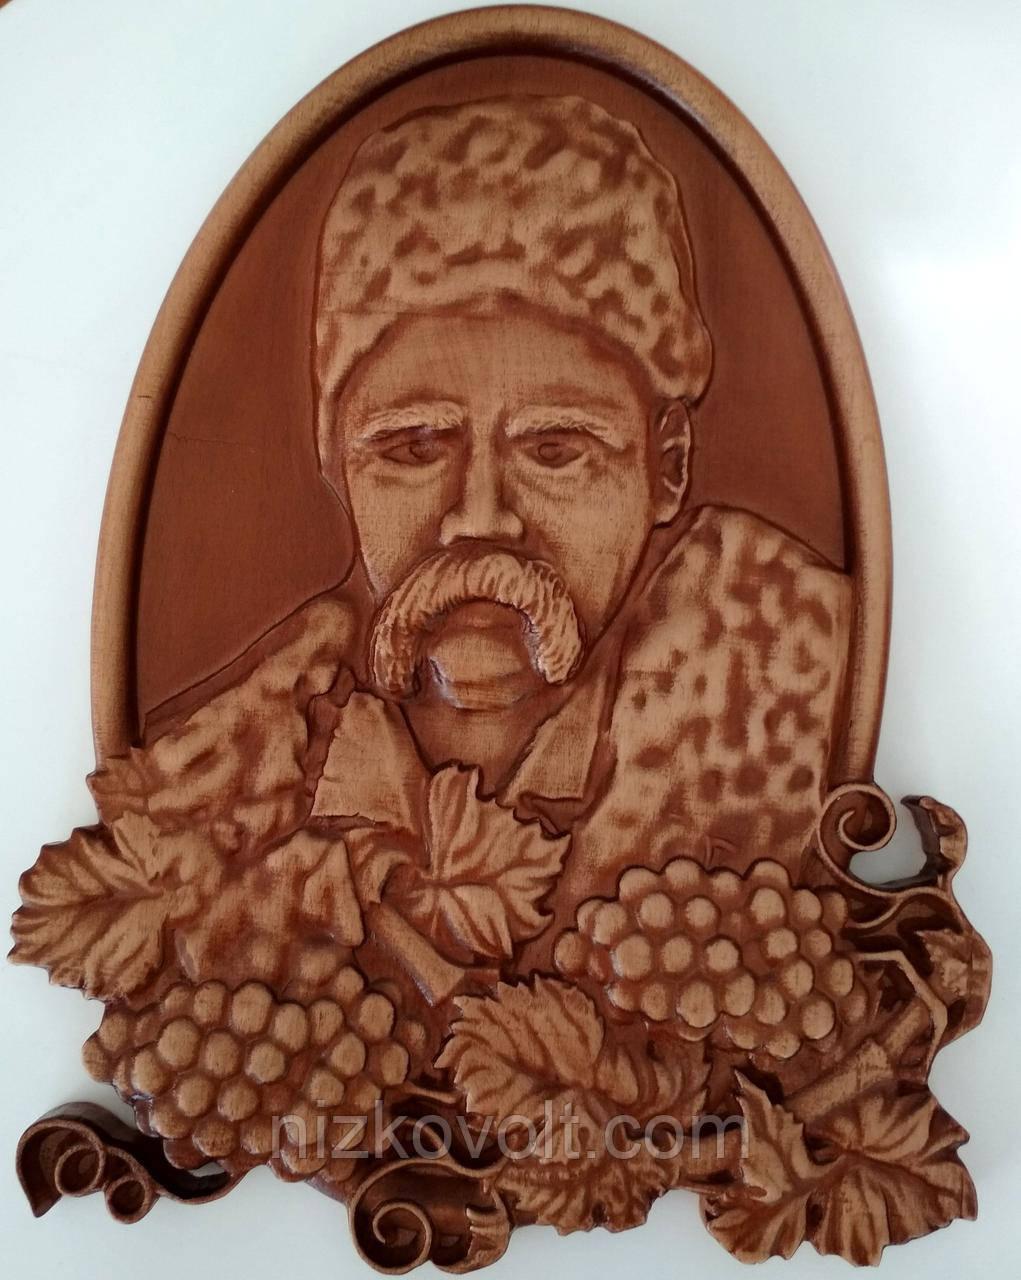 Резное панно с Тарасом Шевченко (портрет) 200х270х18 мм